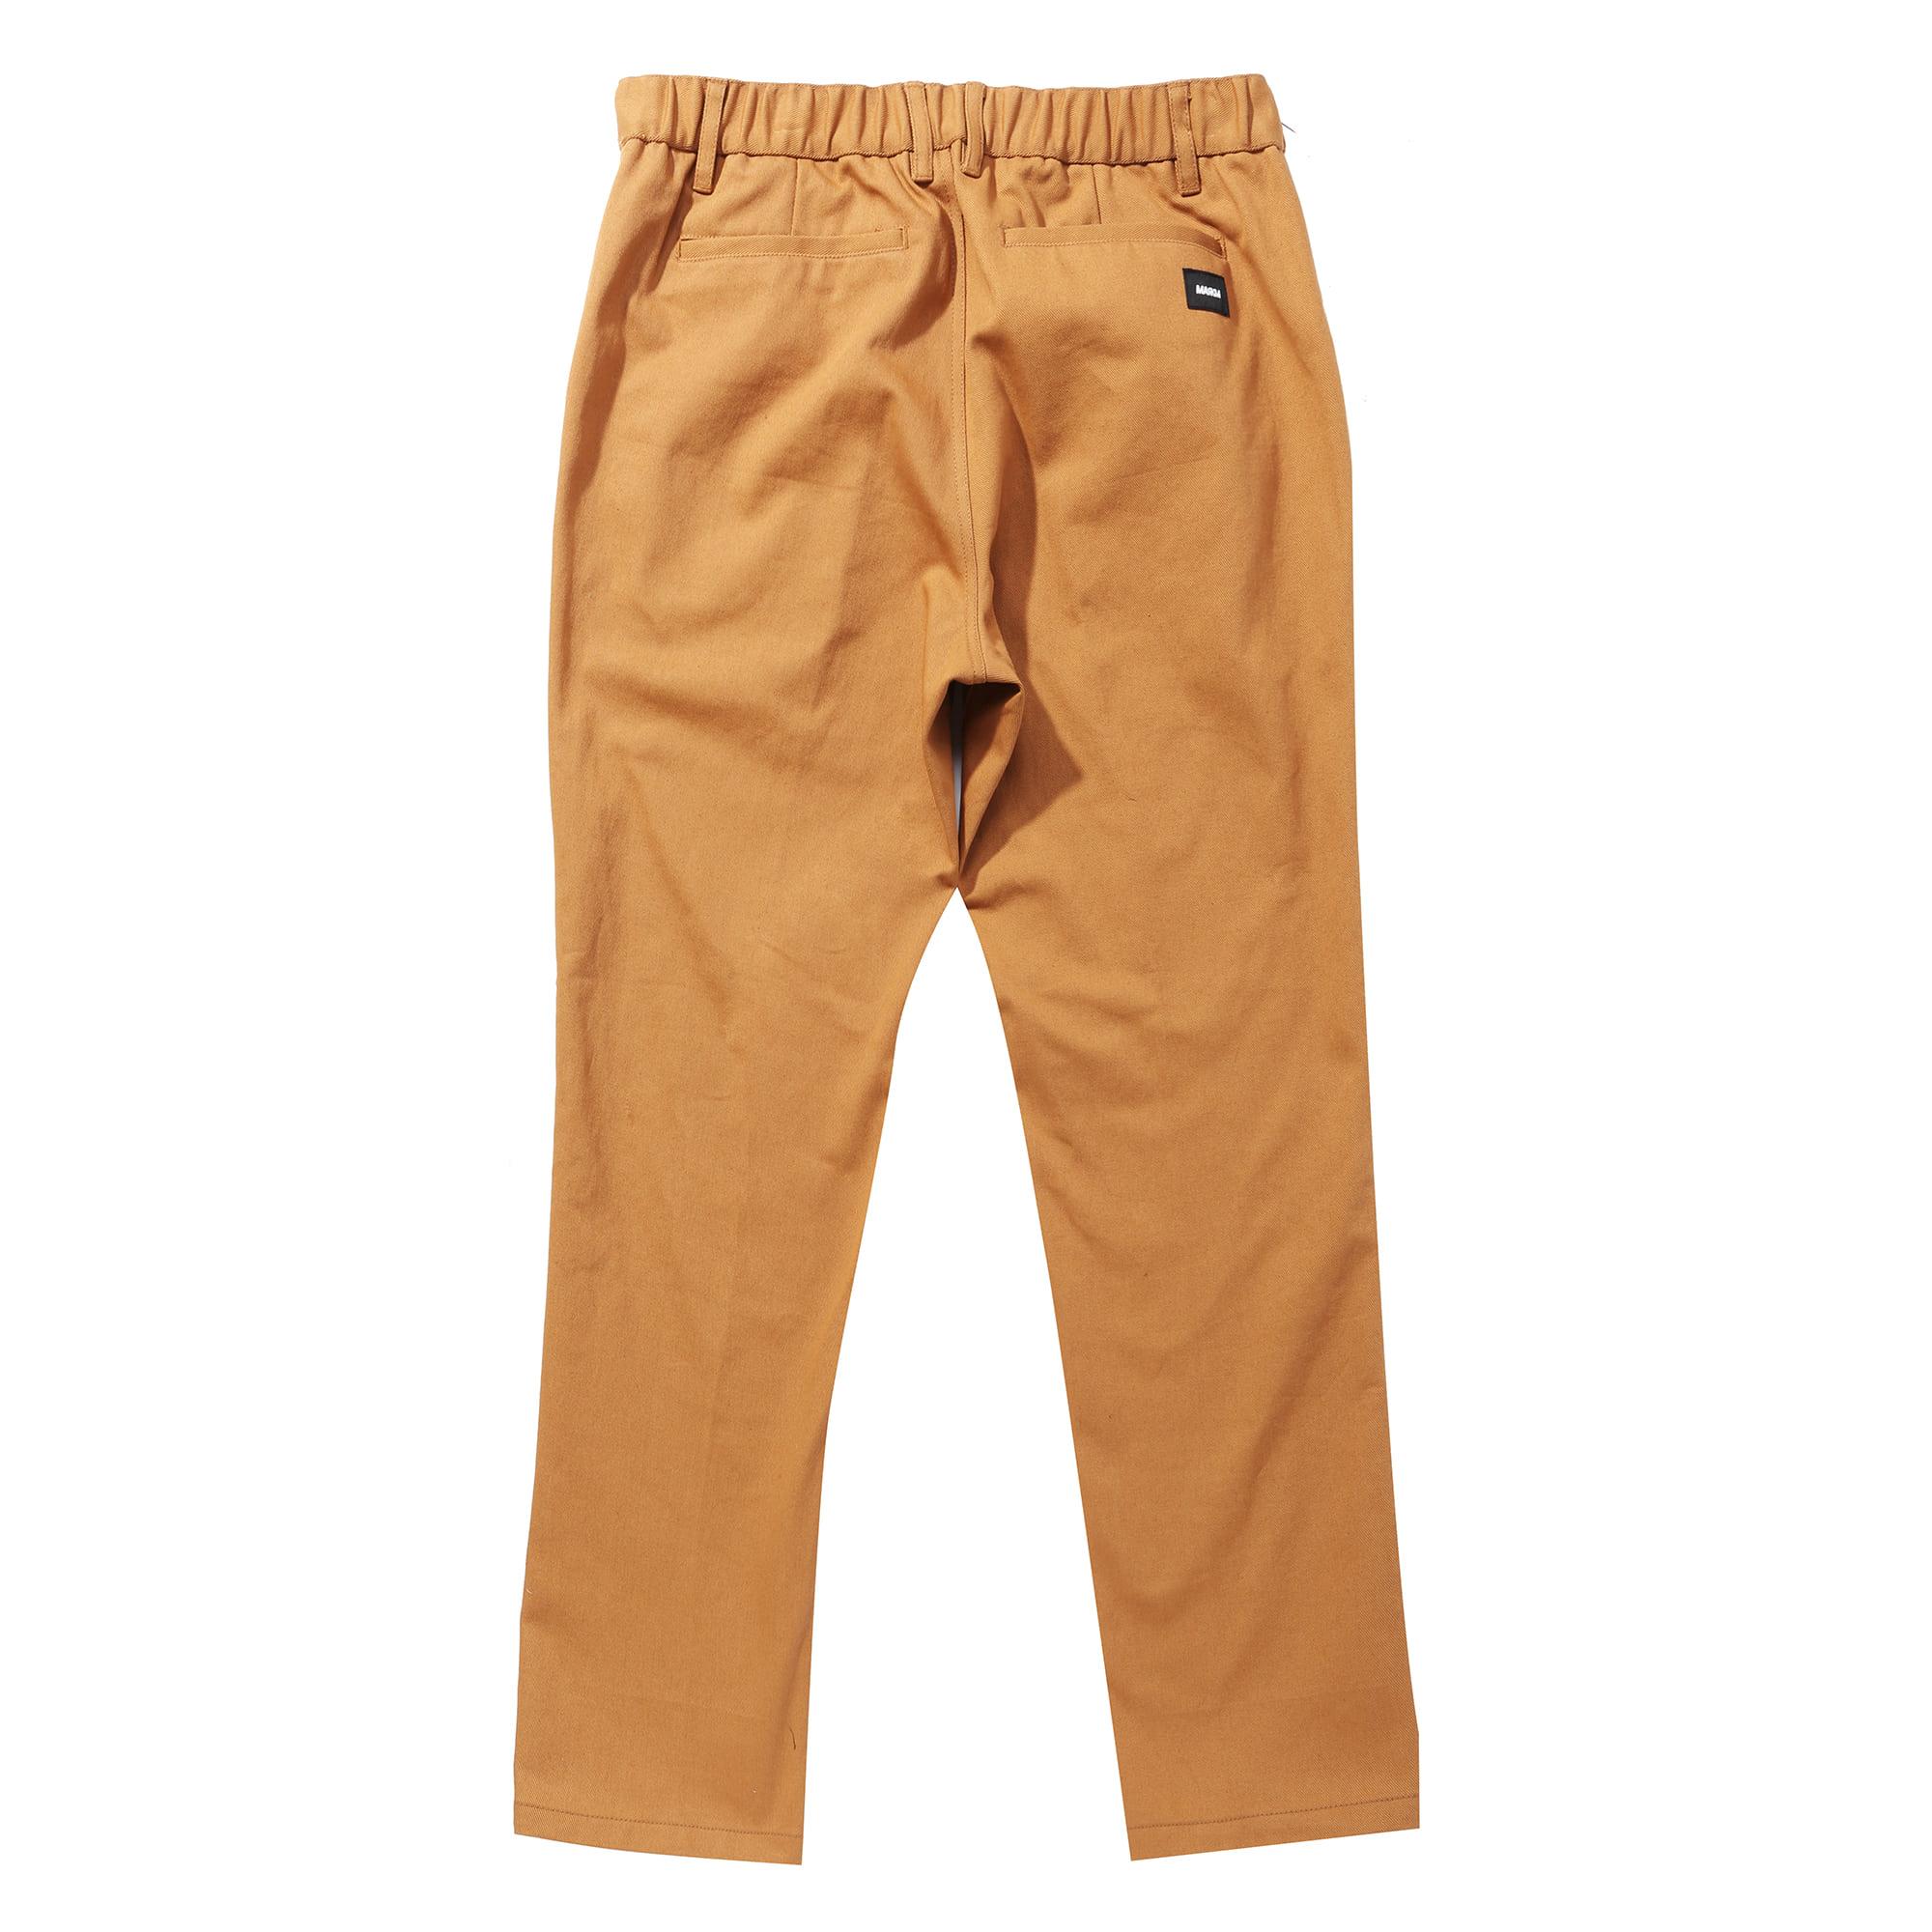 Standard Cotton Pants BE